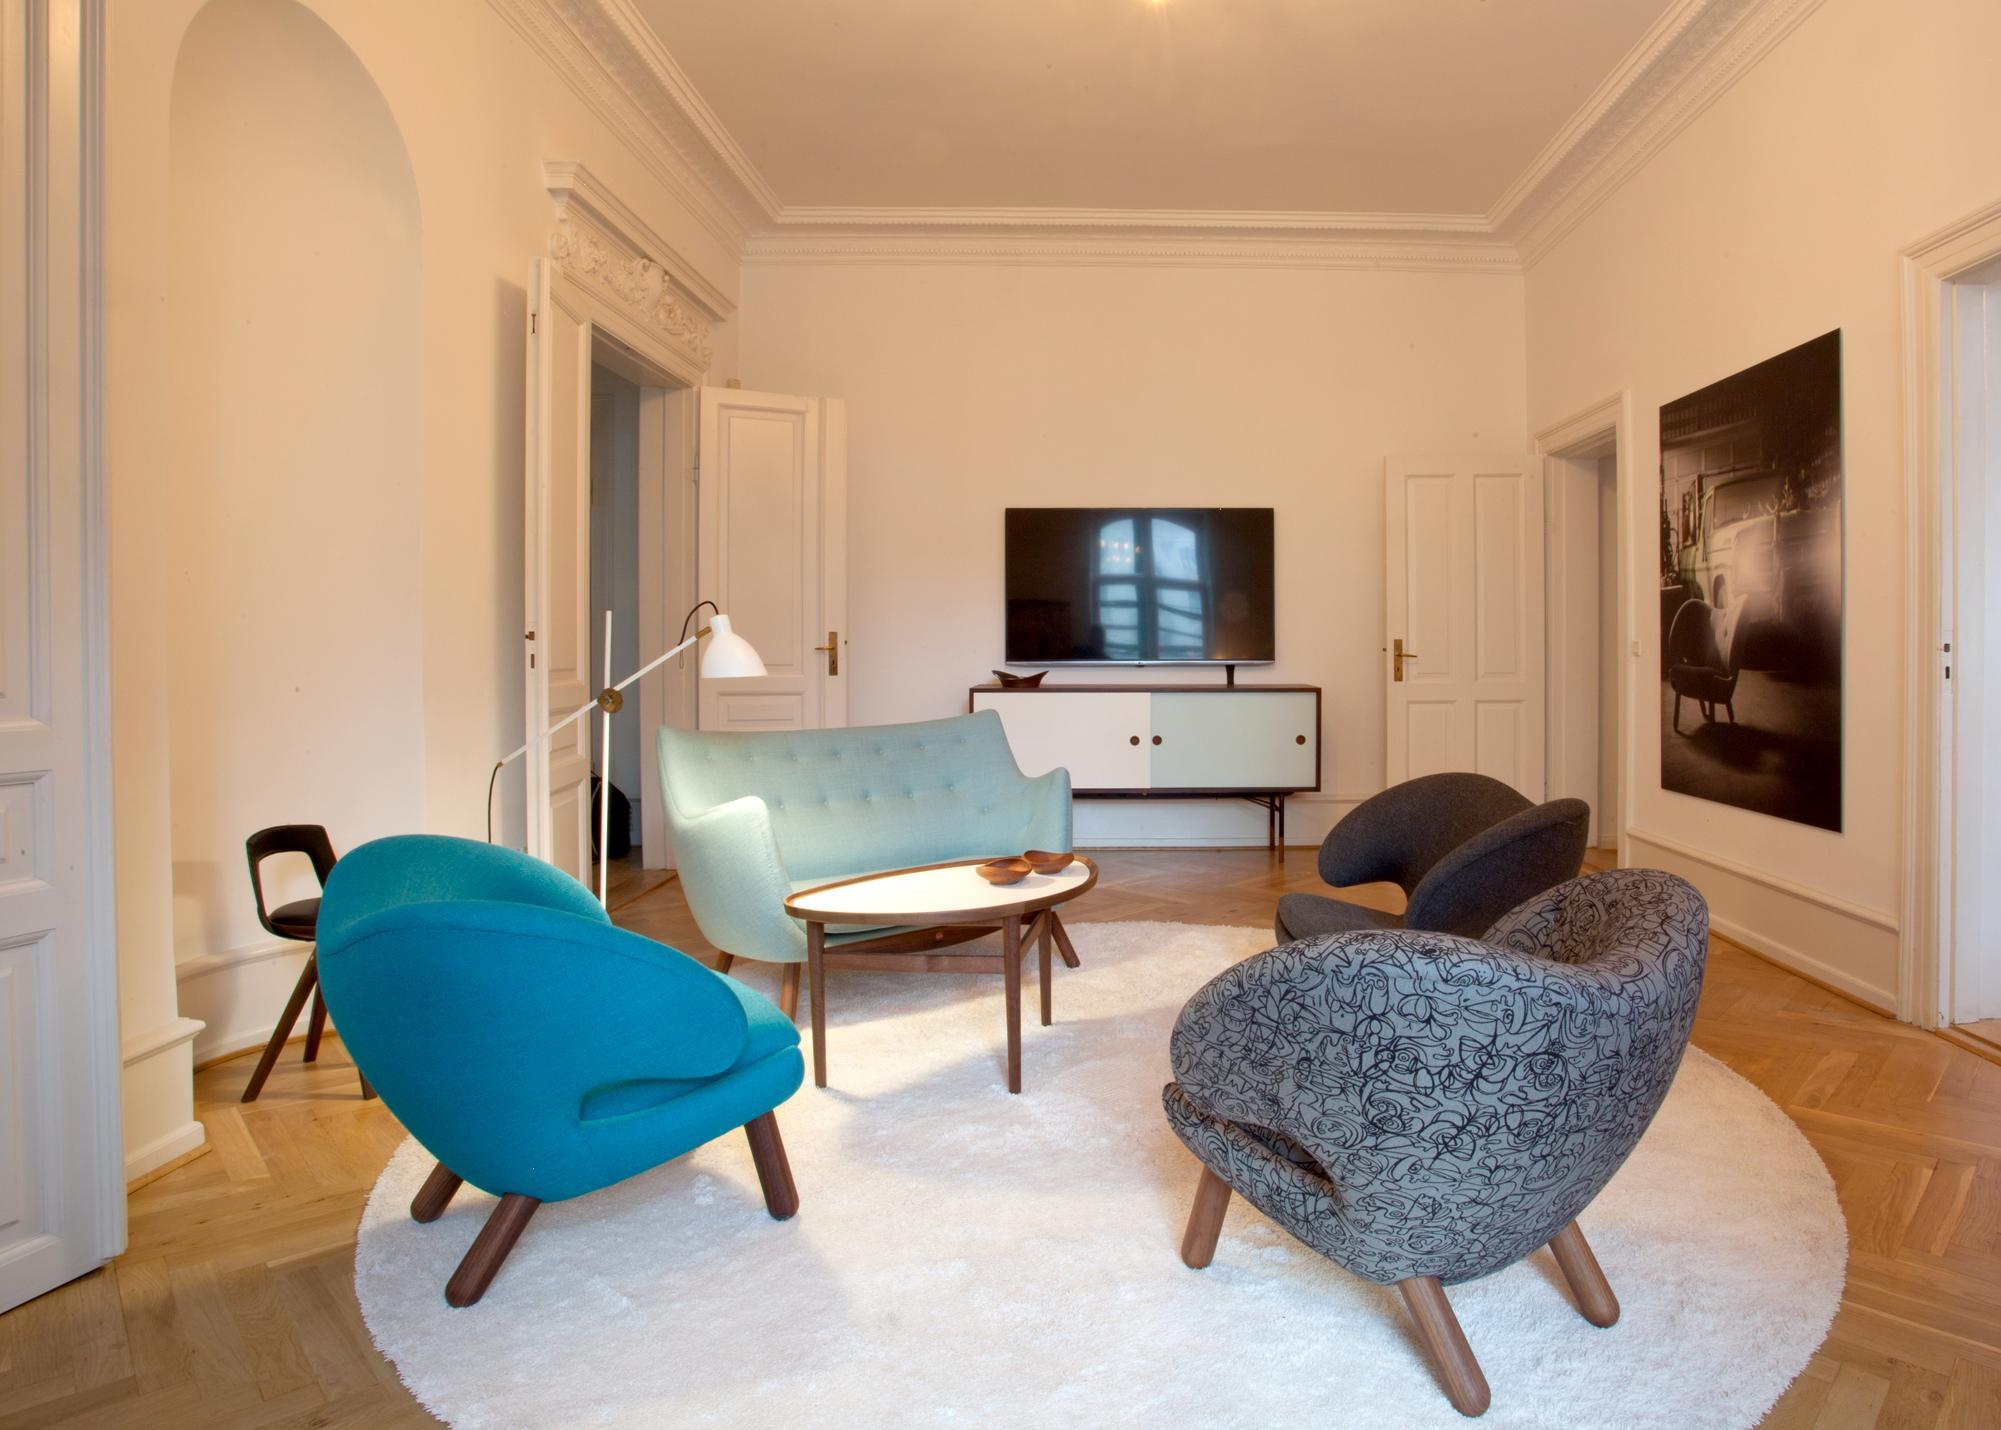 Pelikan Sessel Als Elegante Sitzgruppe Teppich Wohnzimmer Blauessofa COnecollection Finn Juhl